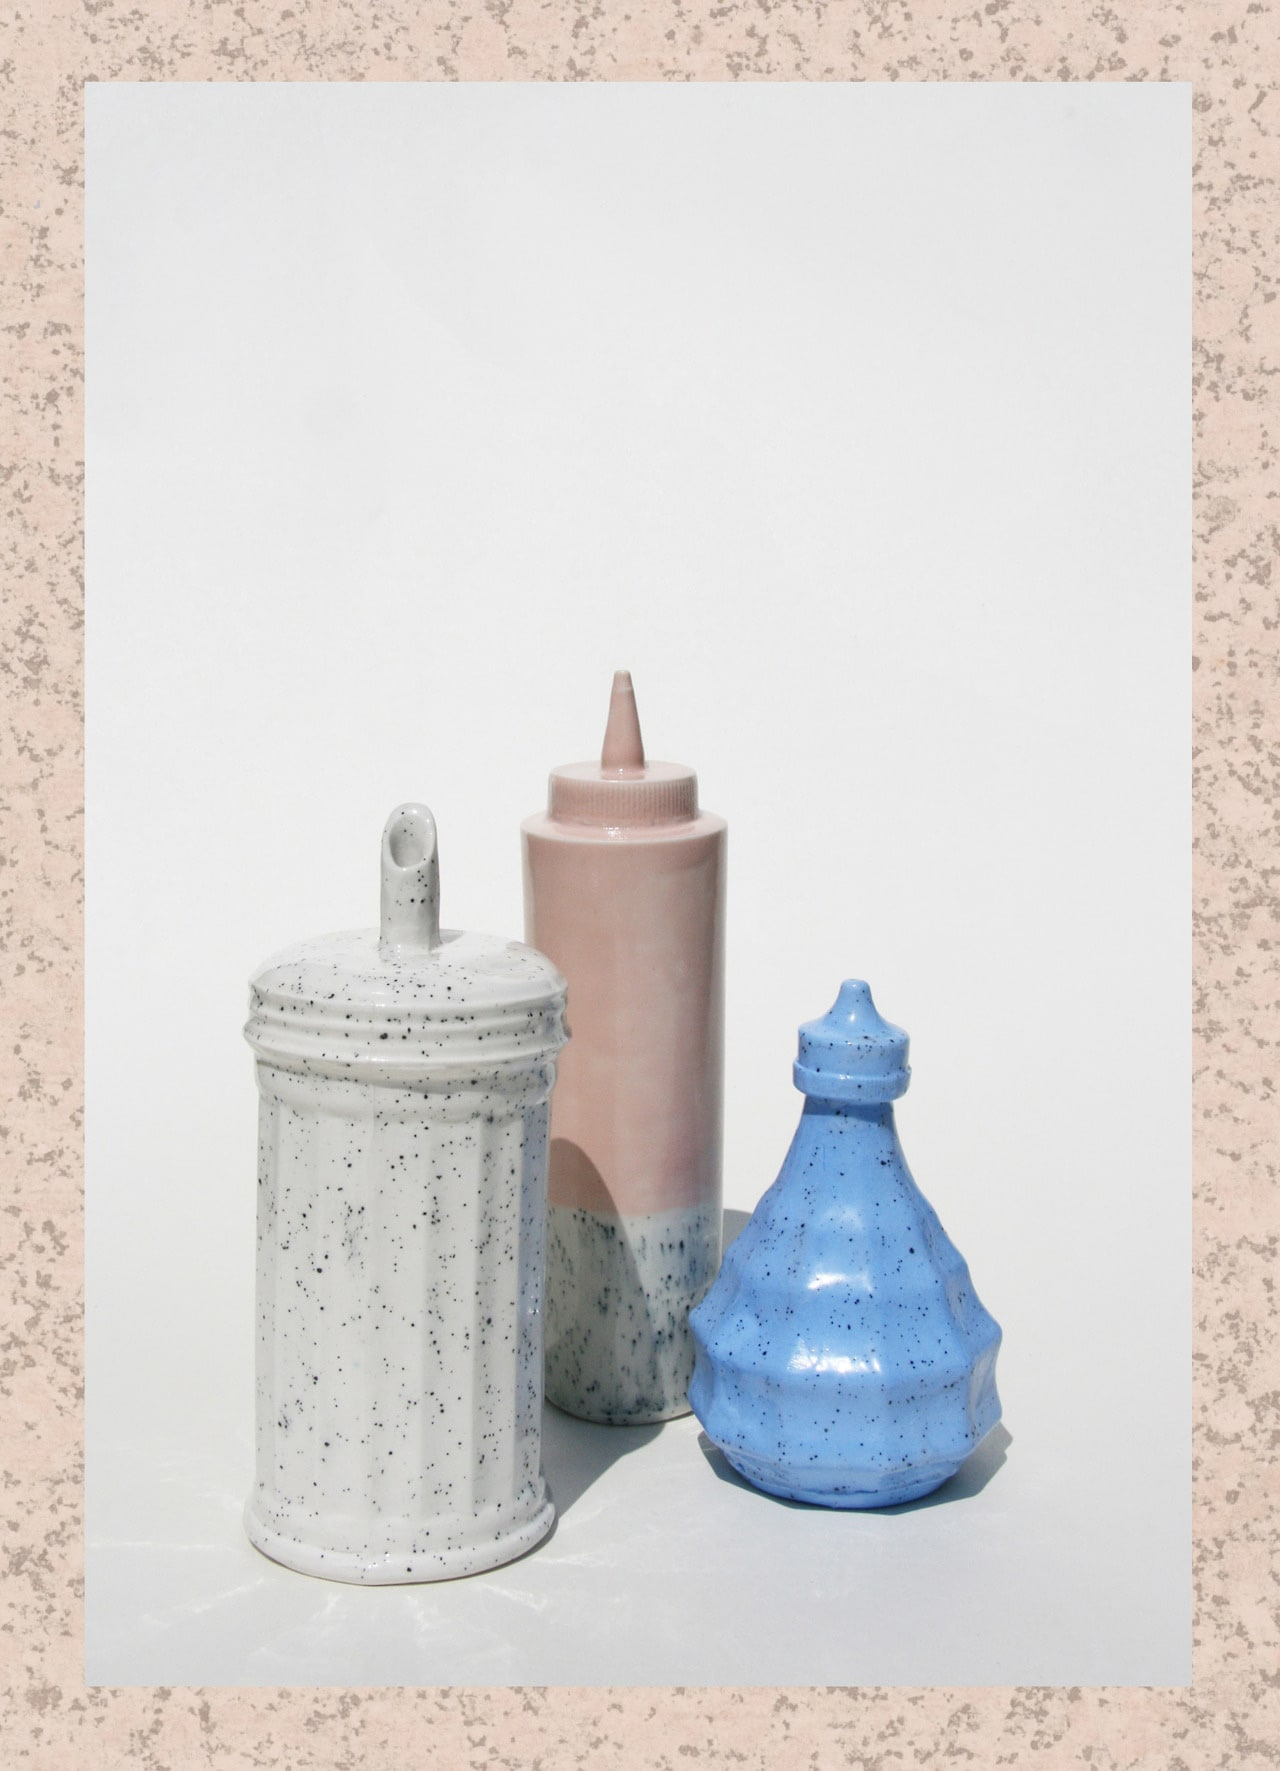 camberwell-ba-Illustration-chloe-greenfield-greasy-spoon-ceramics.jpg